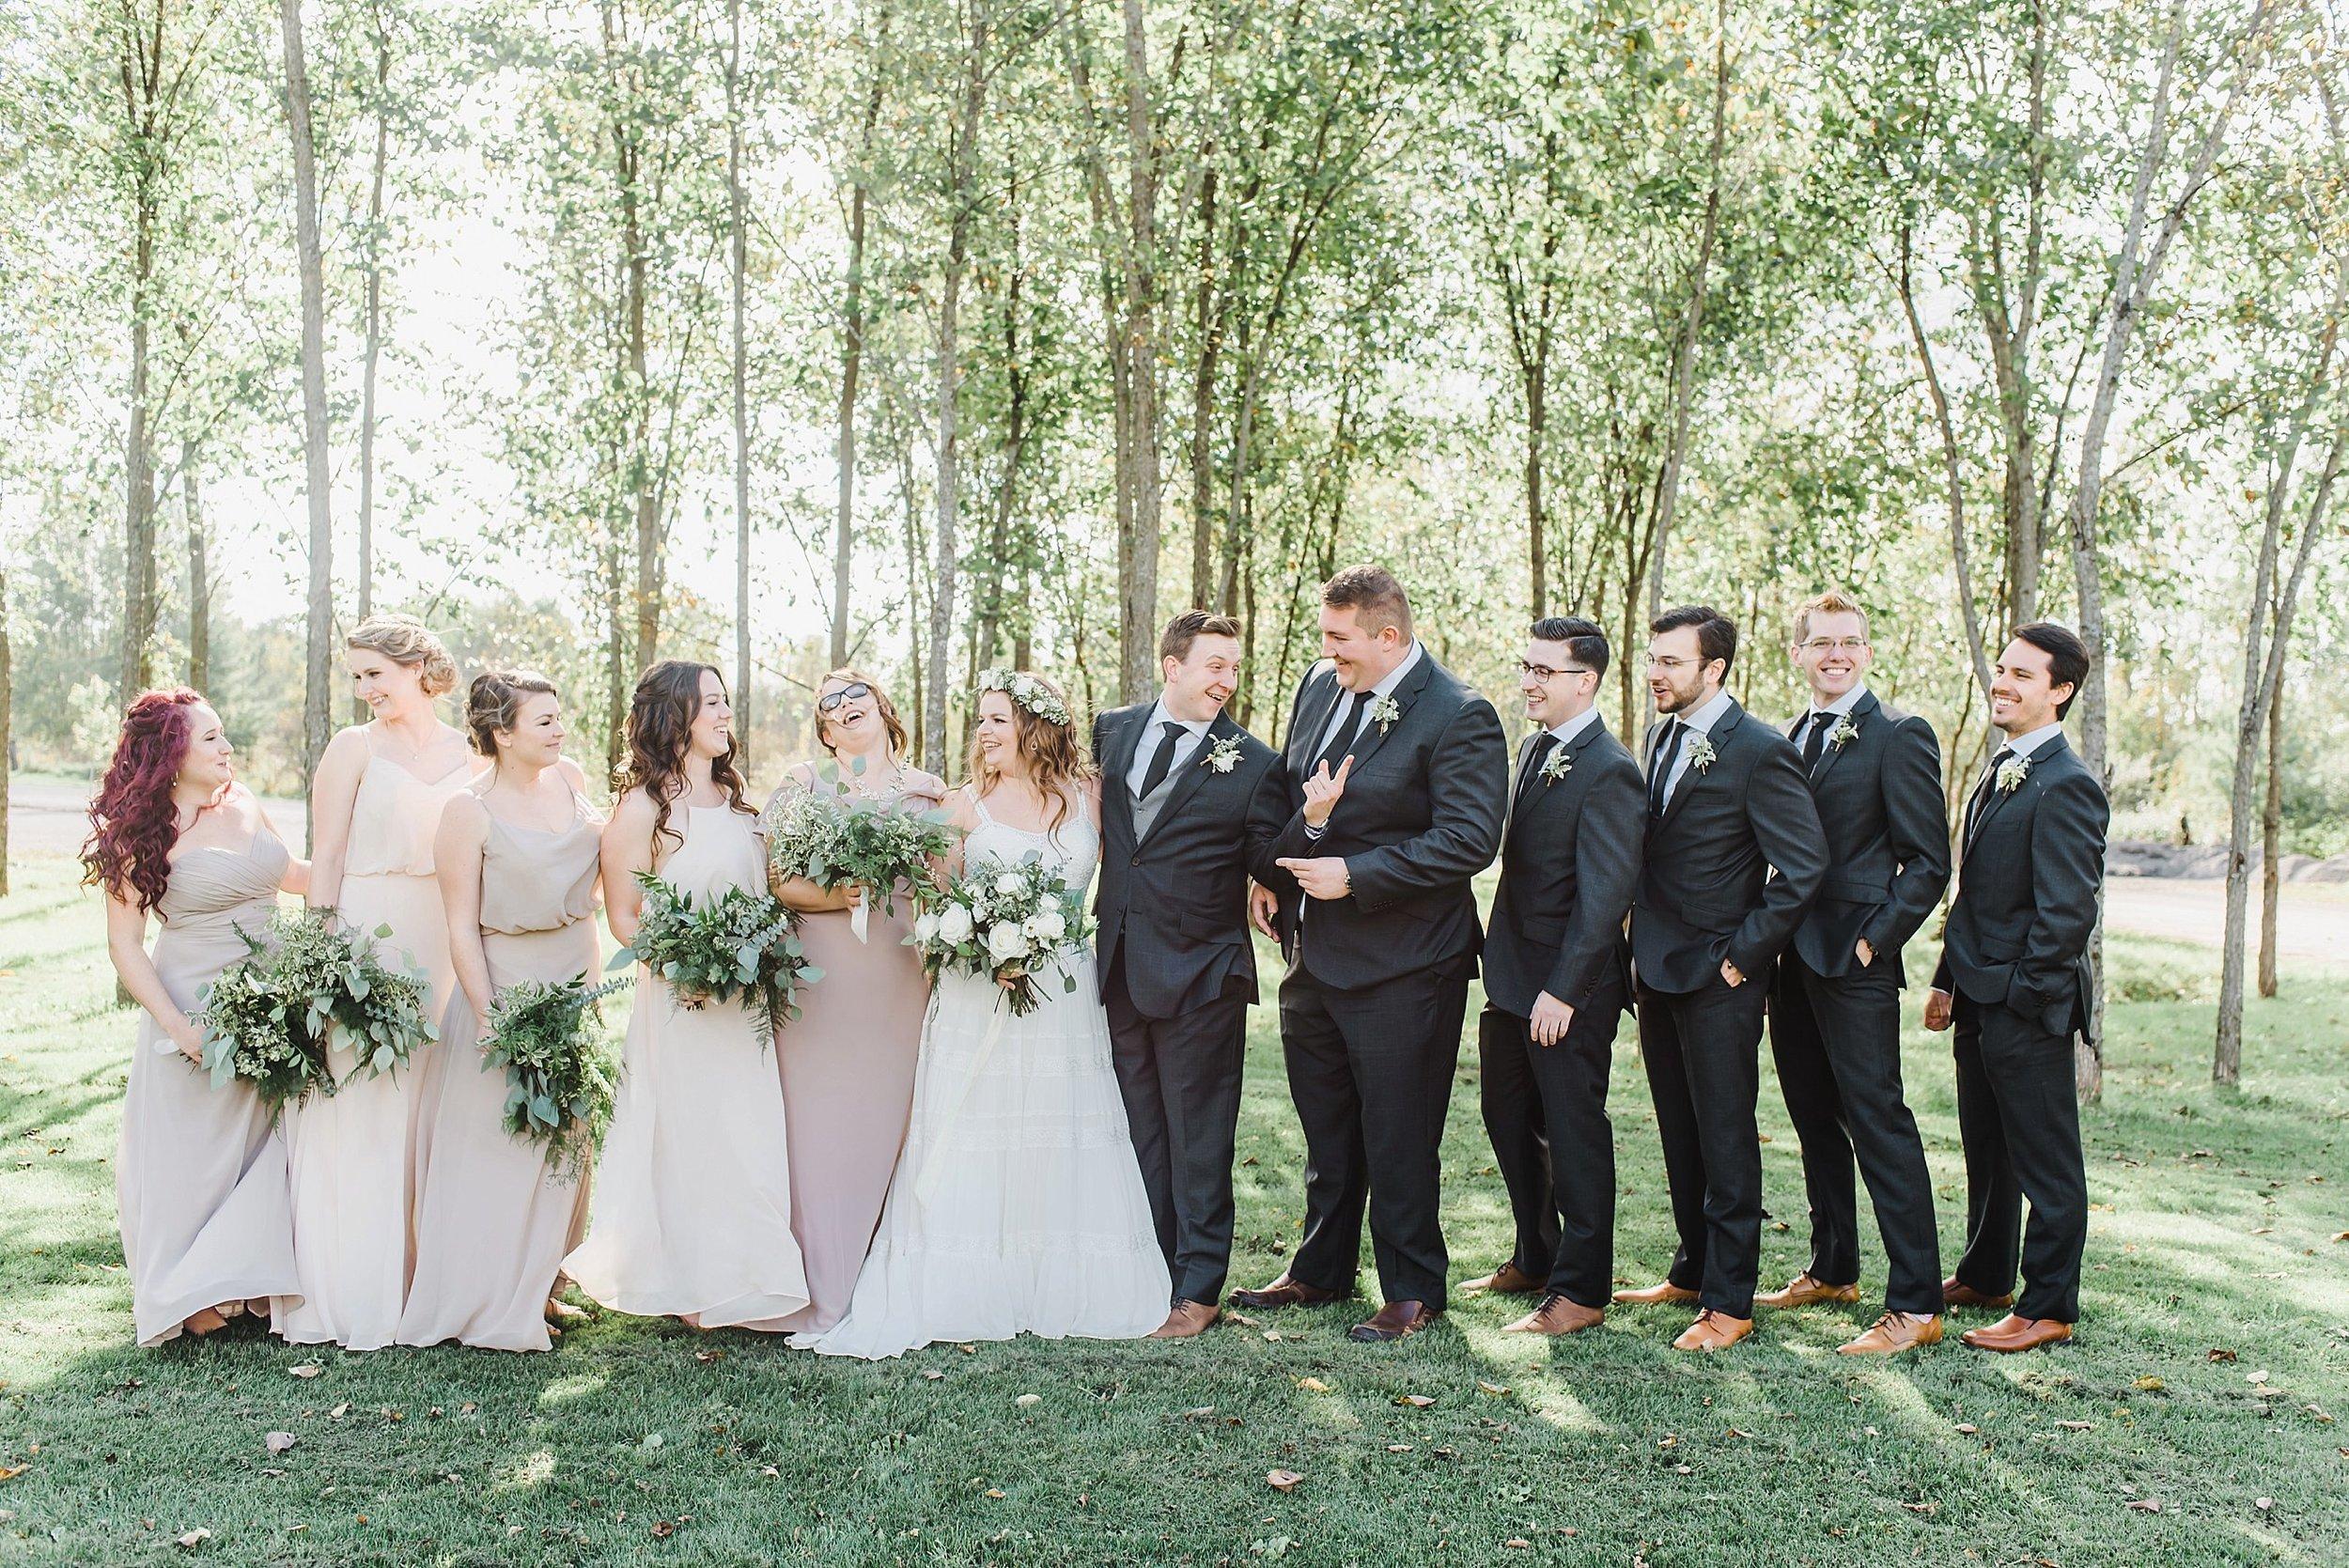 light airy indie fine art ottawa wedding photographer | Ali and Batoul Photography_1129.jpg